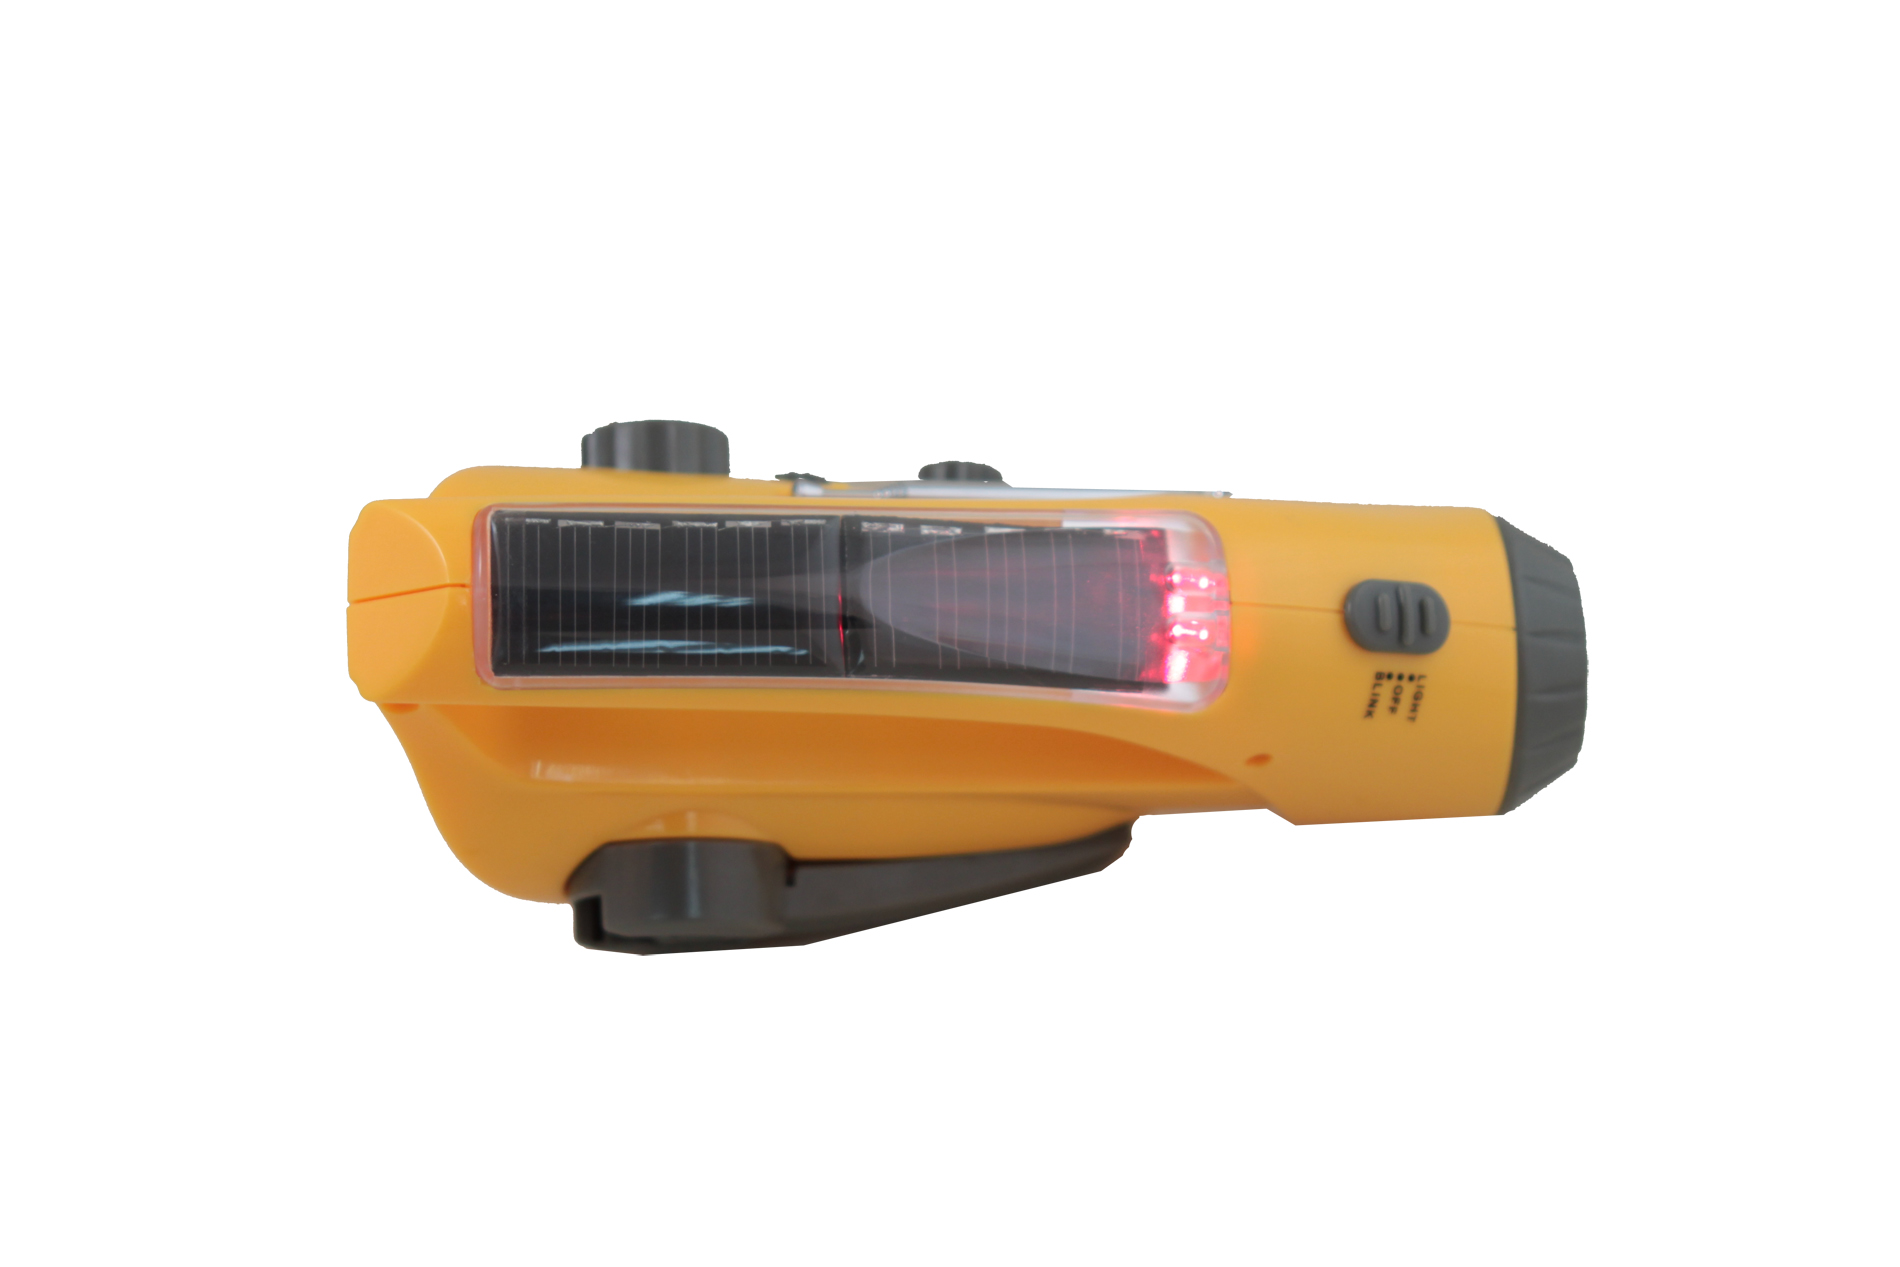 Wind-Up-Dynamo-Solar-Flashlight-Charger-FM-Radio thumbnail 6